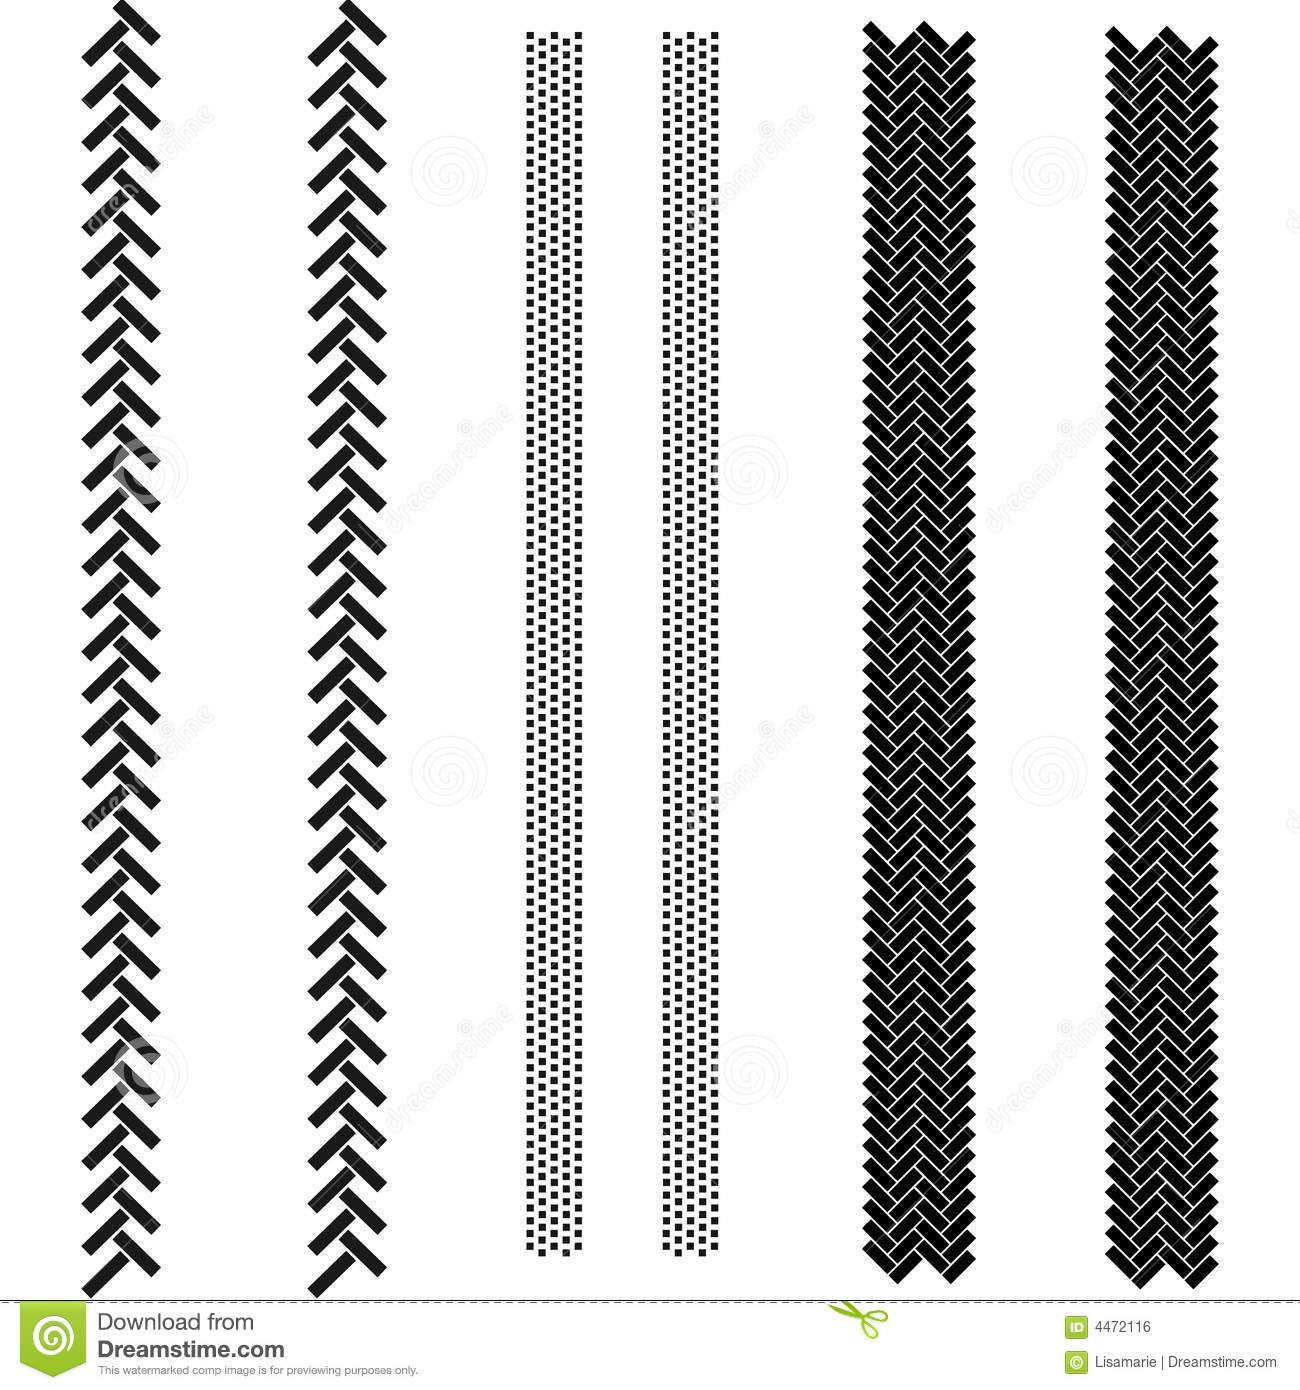 Tractor Tire Tracks Clipart.